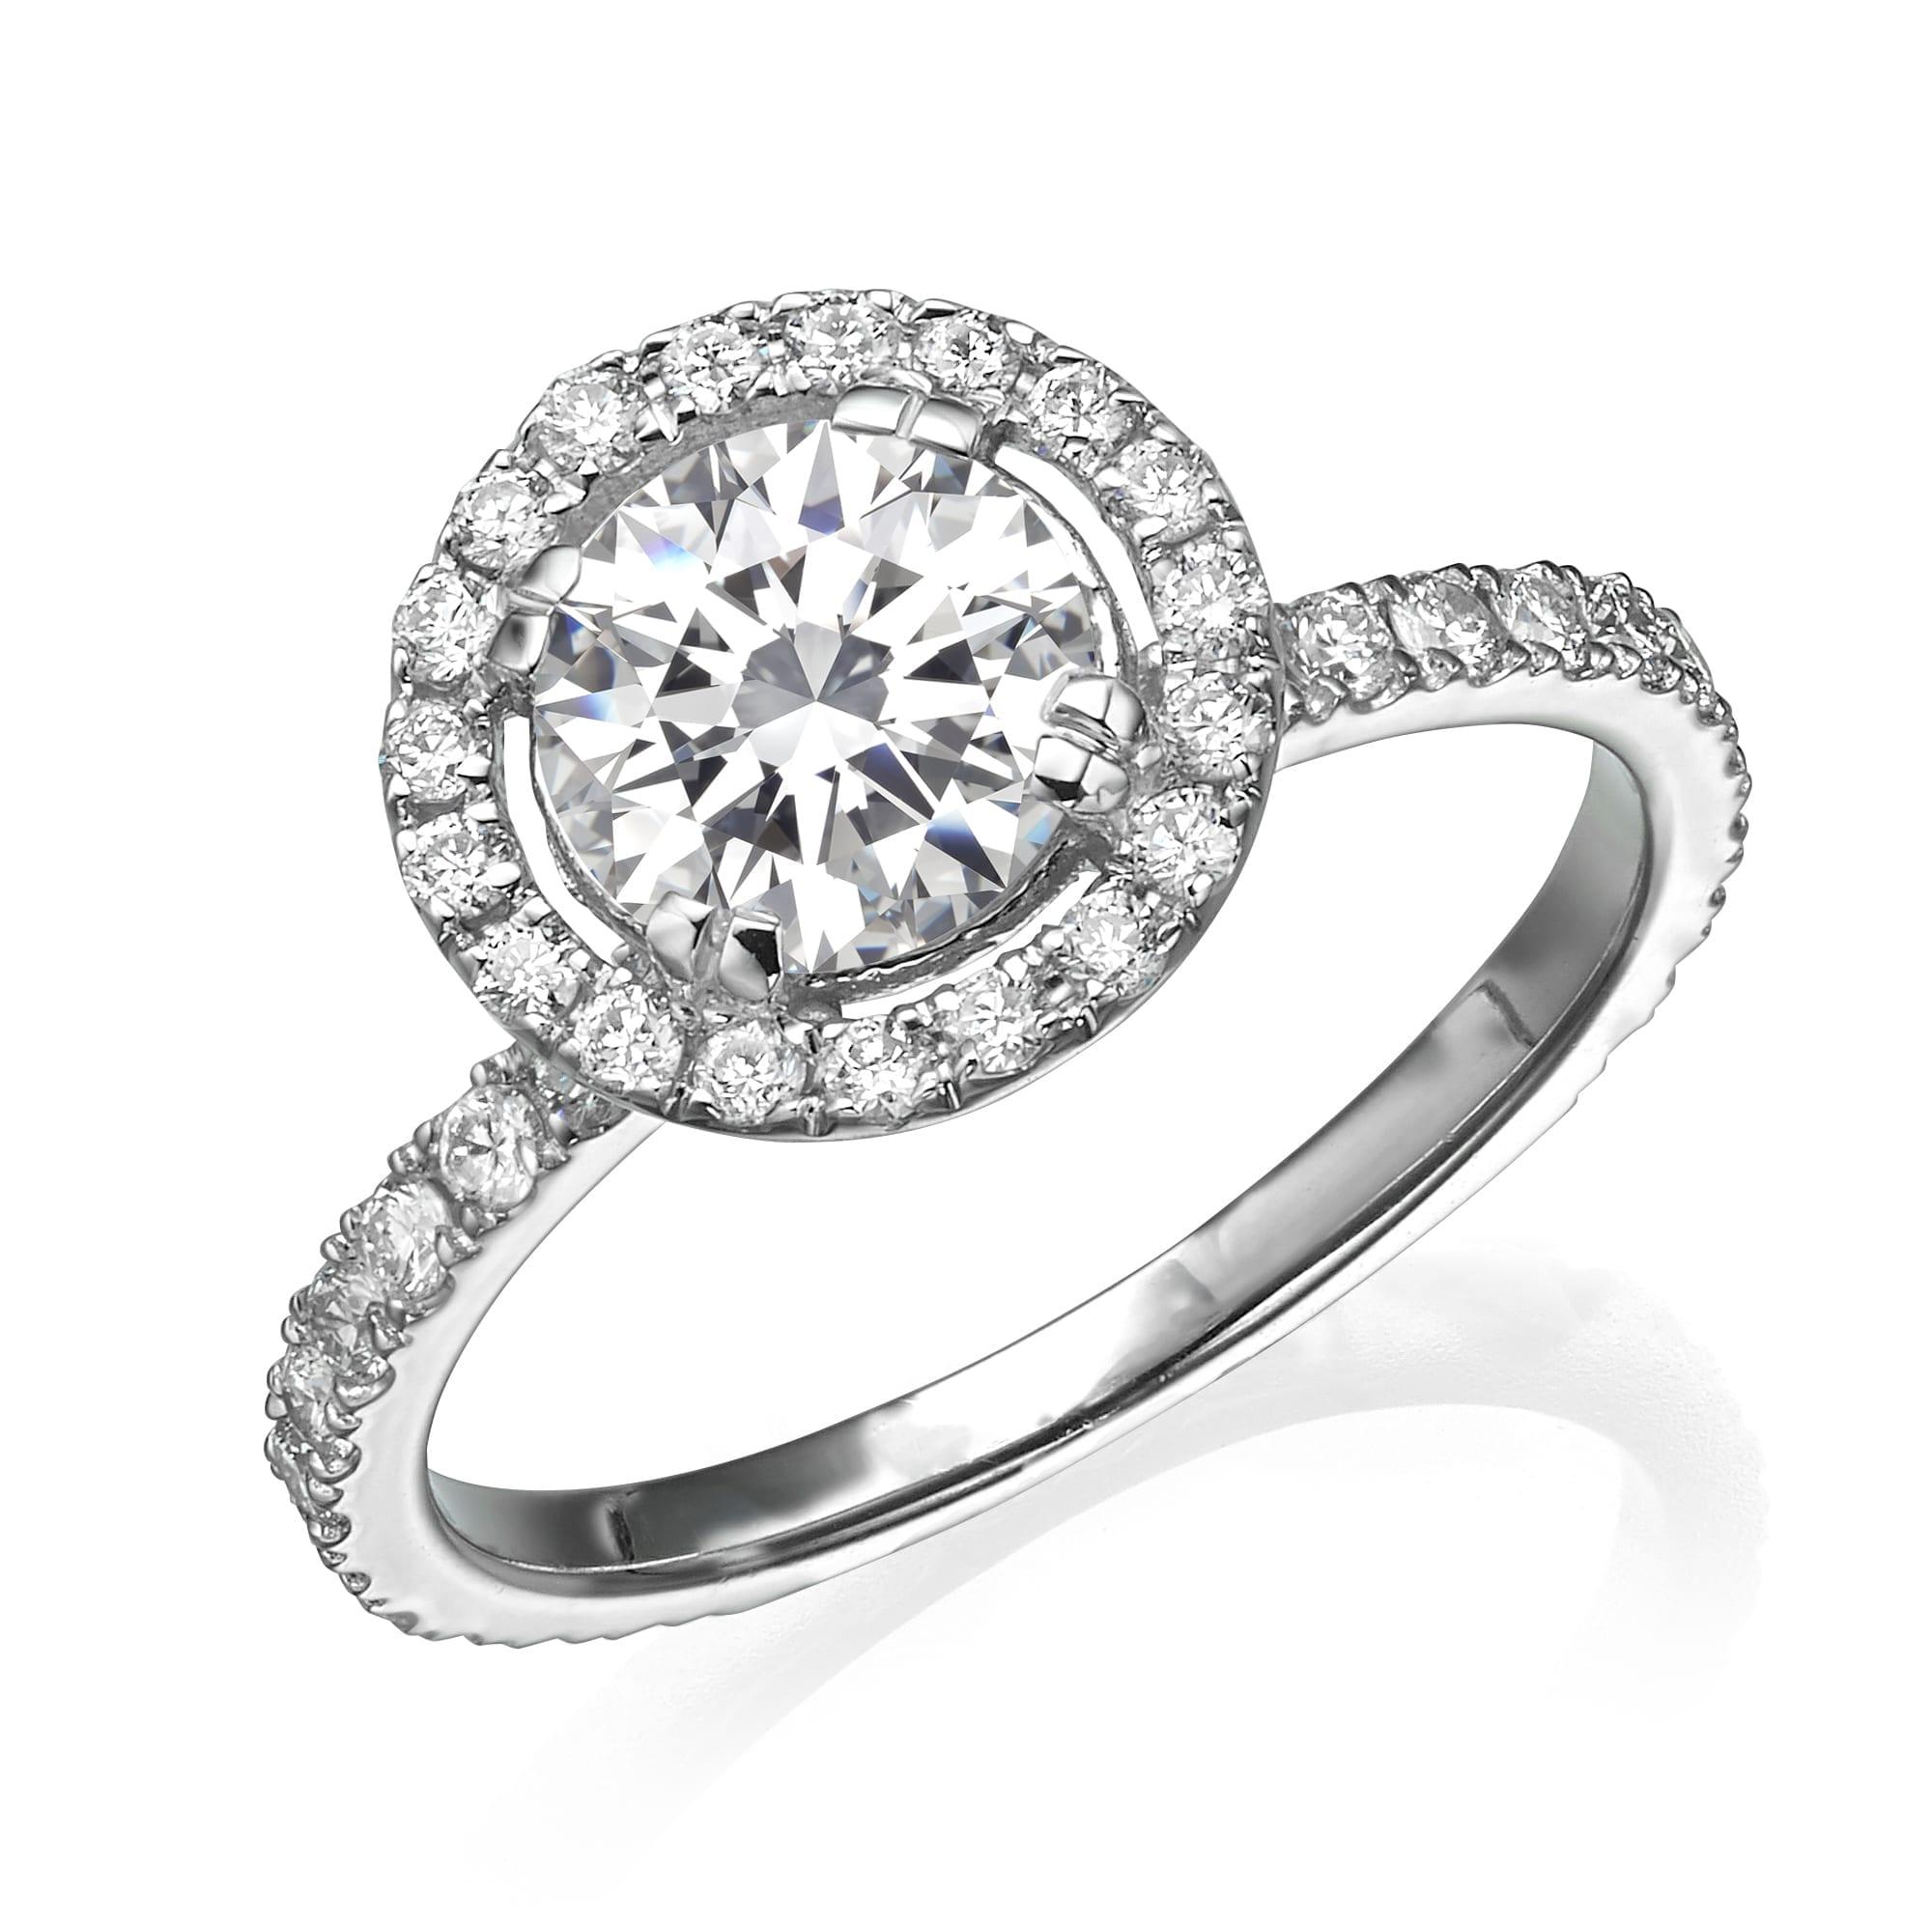 טבעת אירוסין 1.72 קראט!